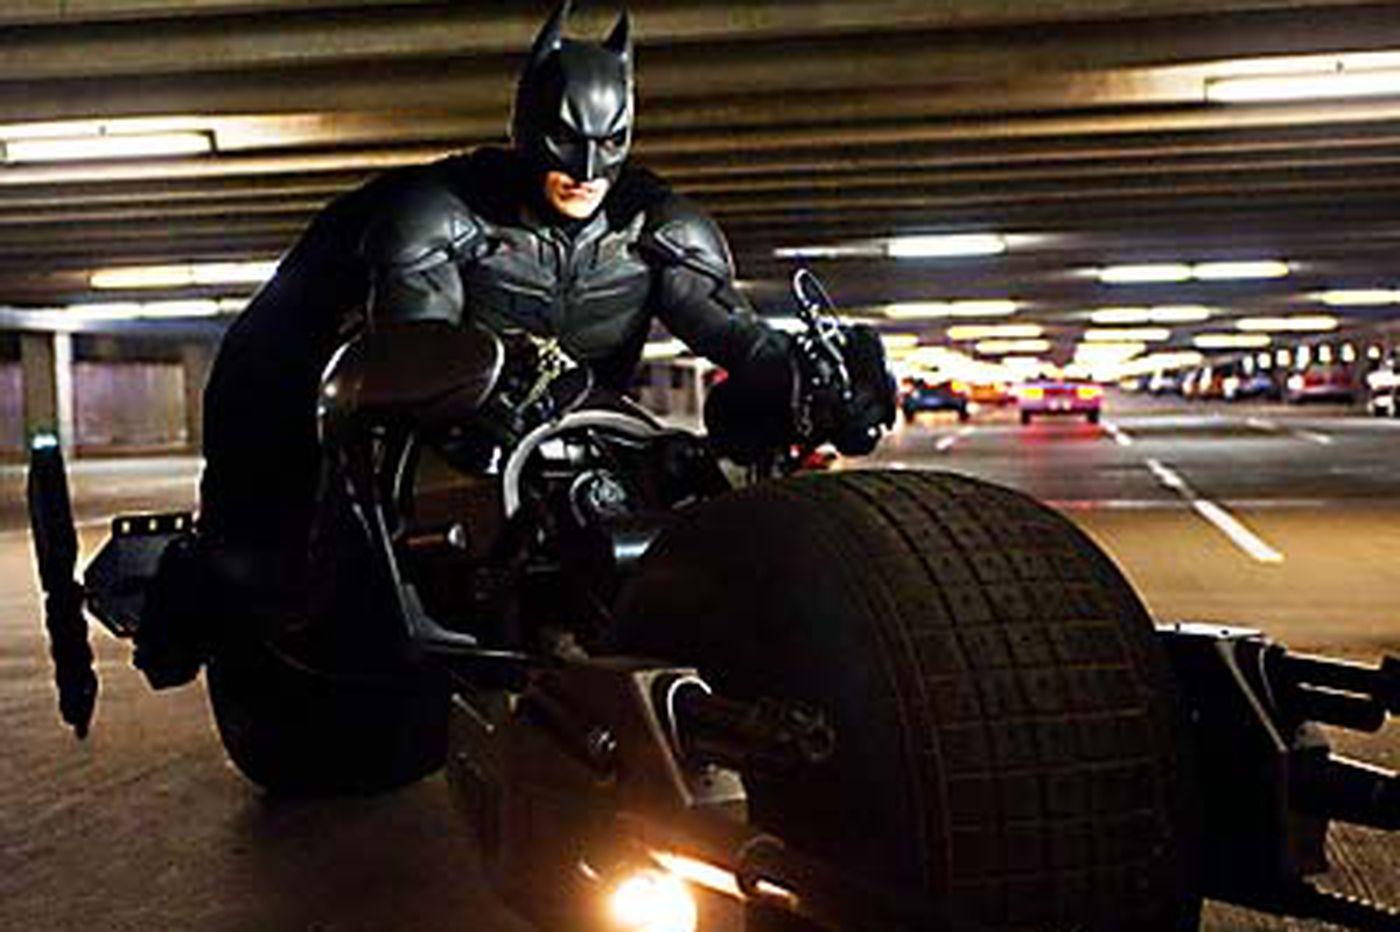 Sideshow: Batman still rises over all